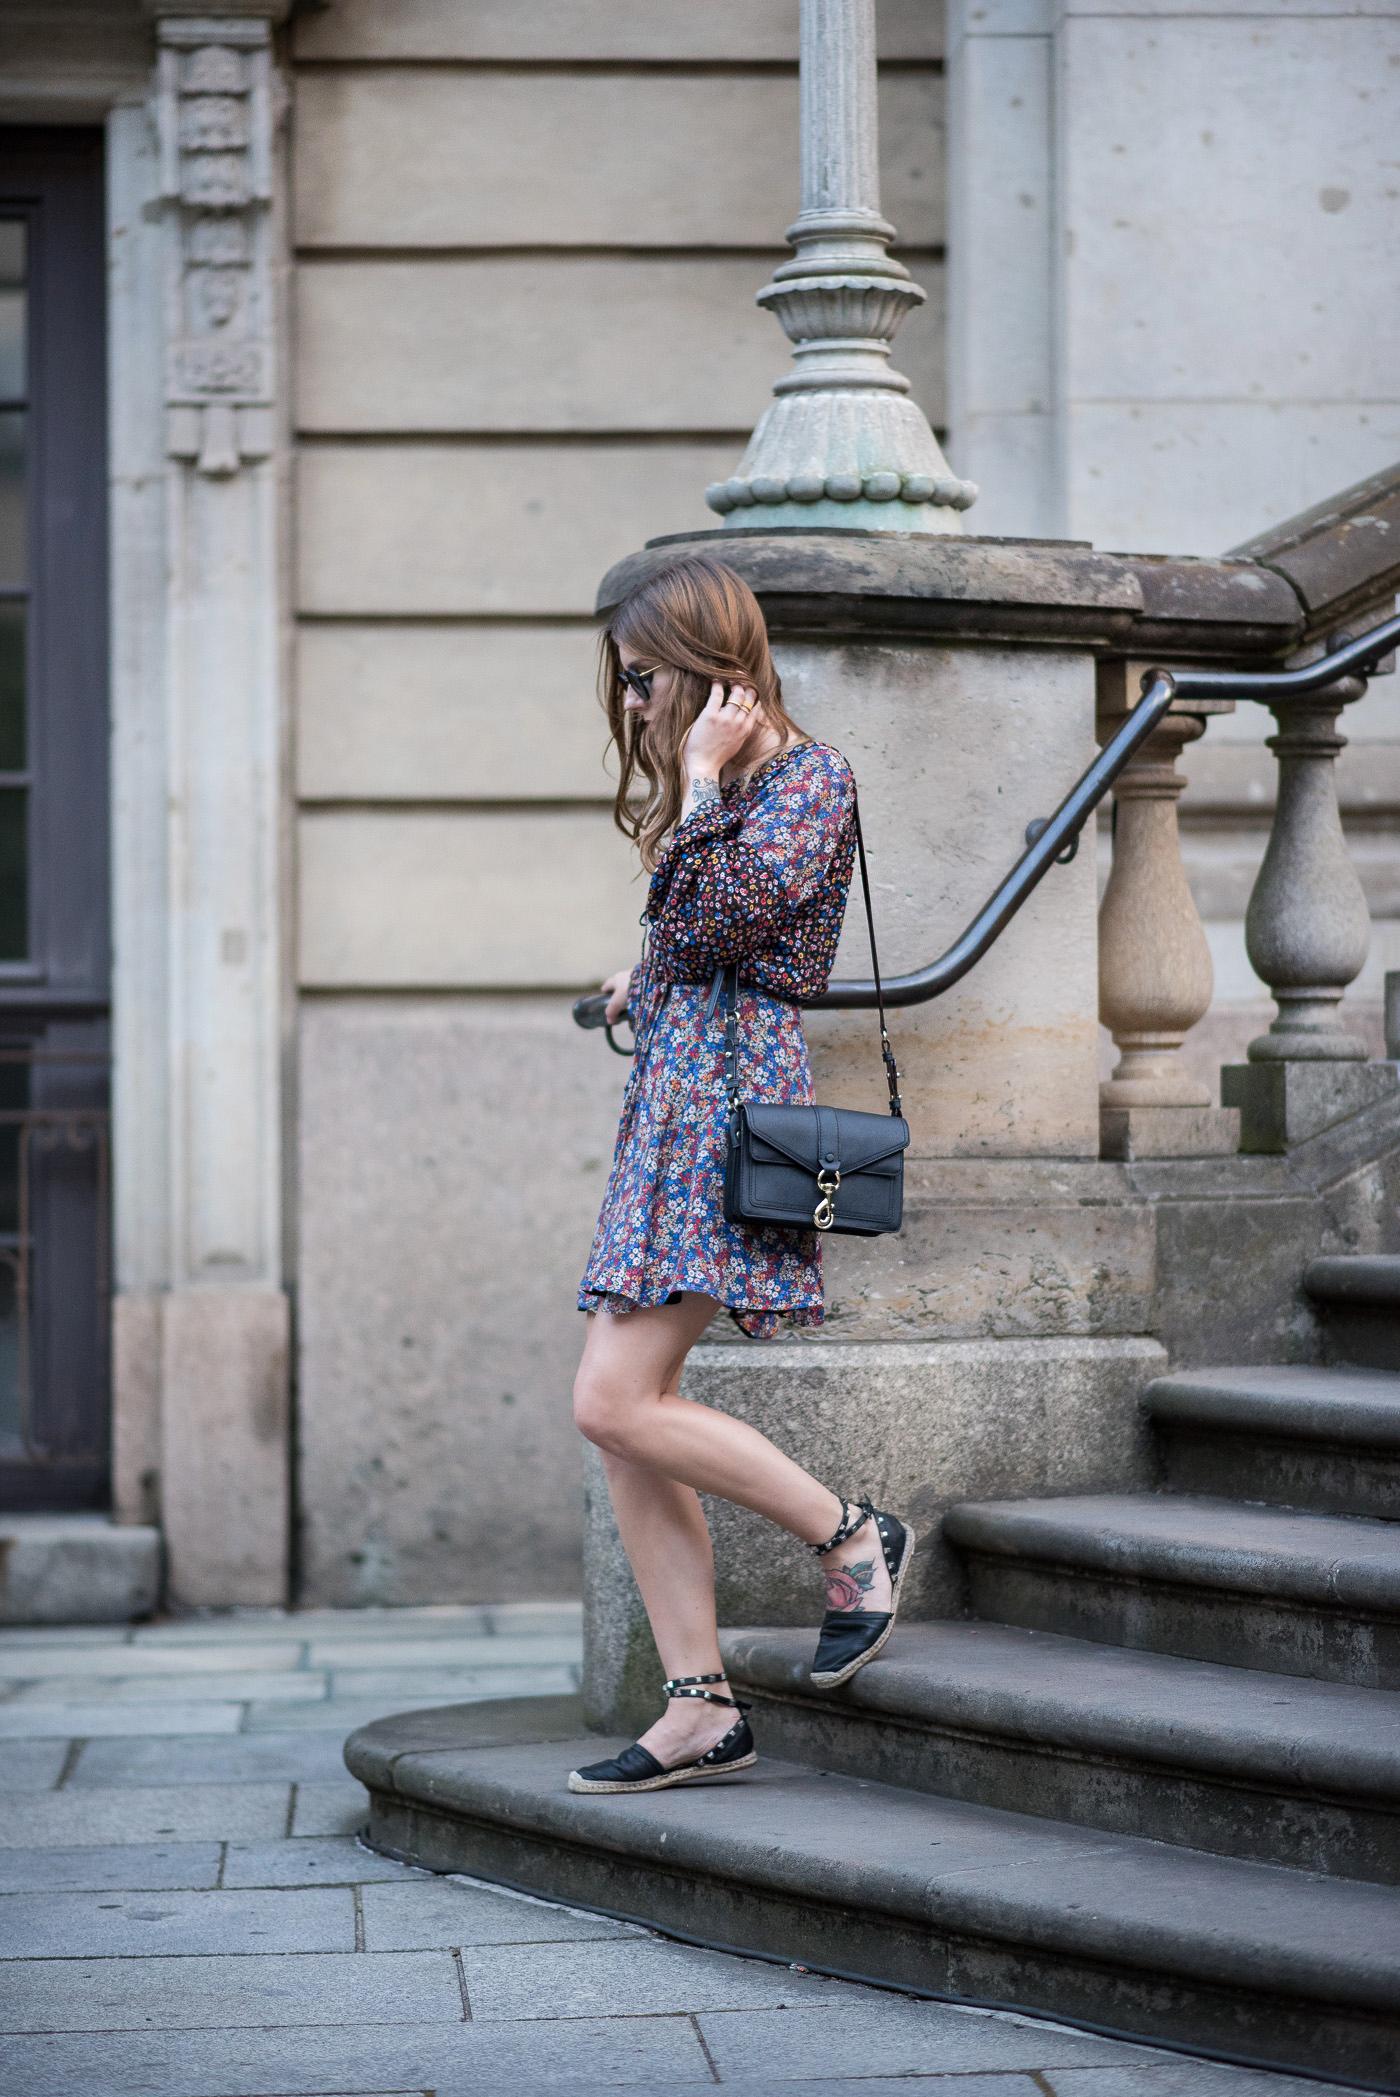 Floral_Summer_Dress_Berlin_Outfit_1